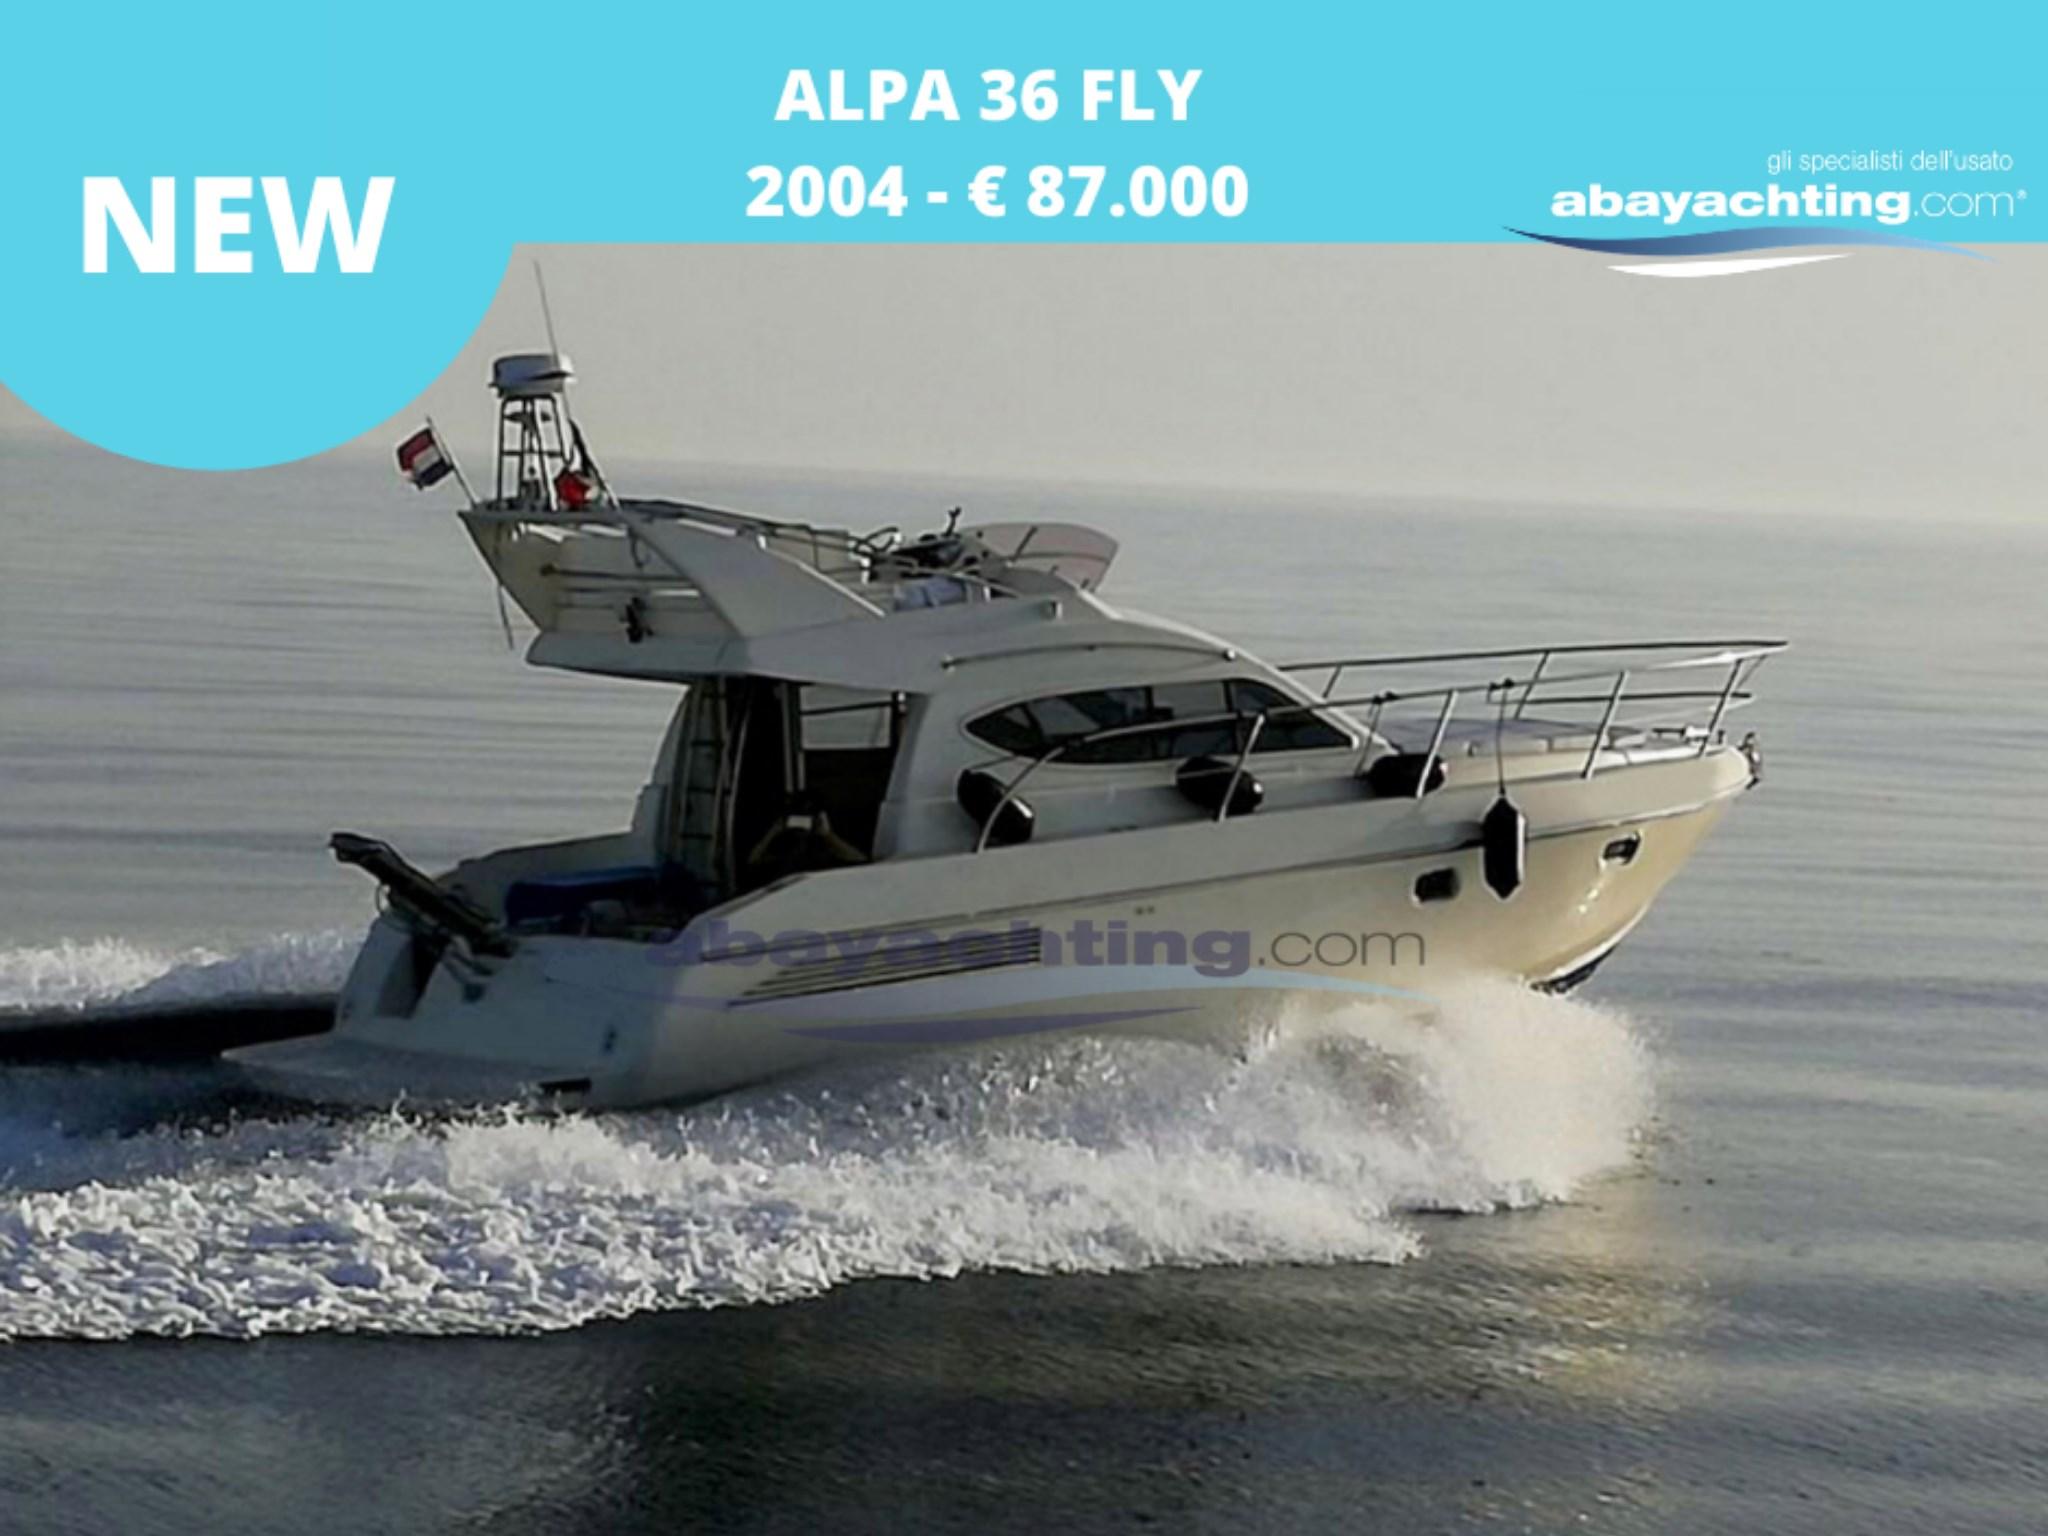 New arrival Alpa 36 Fly